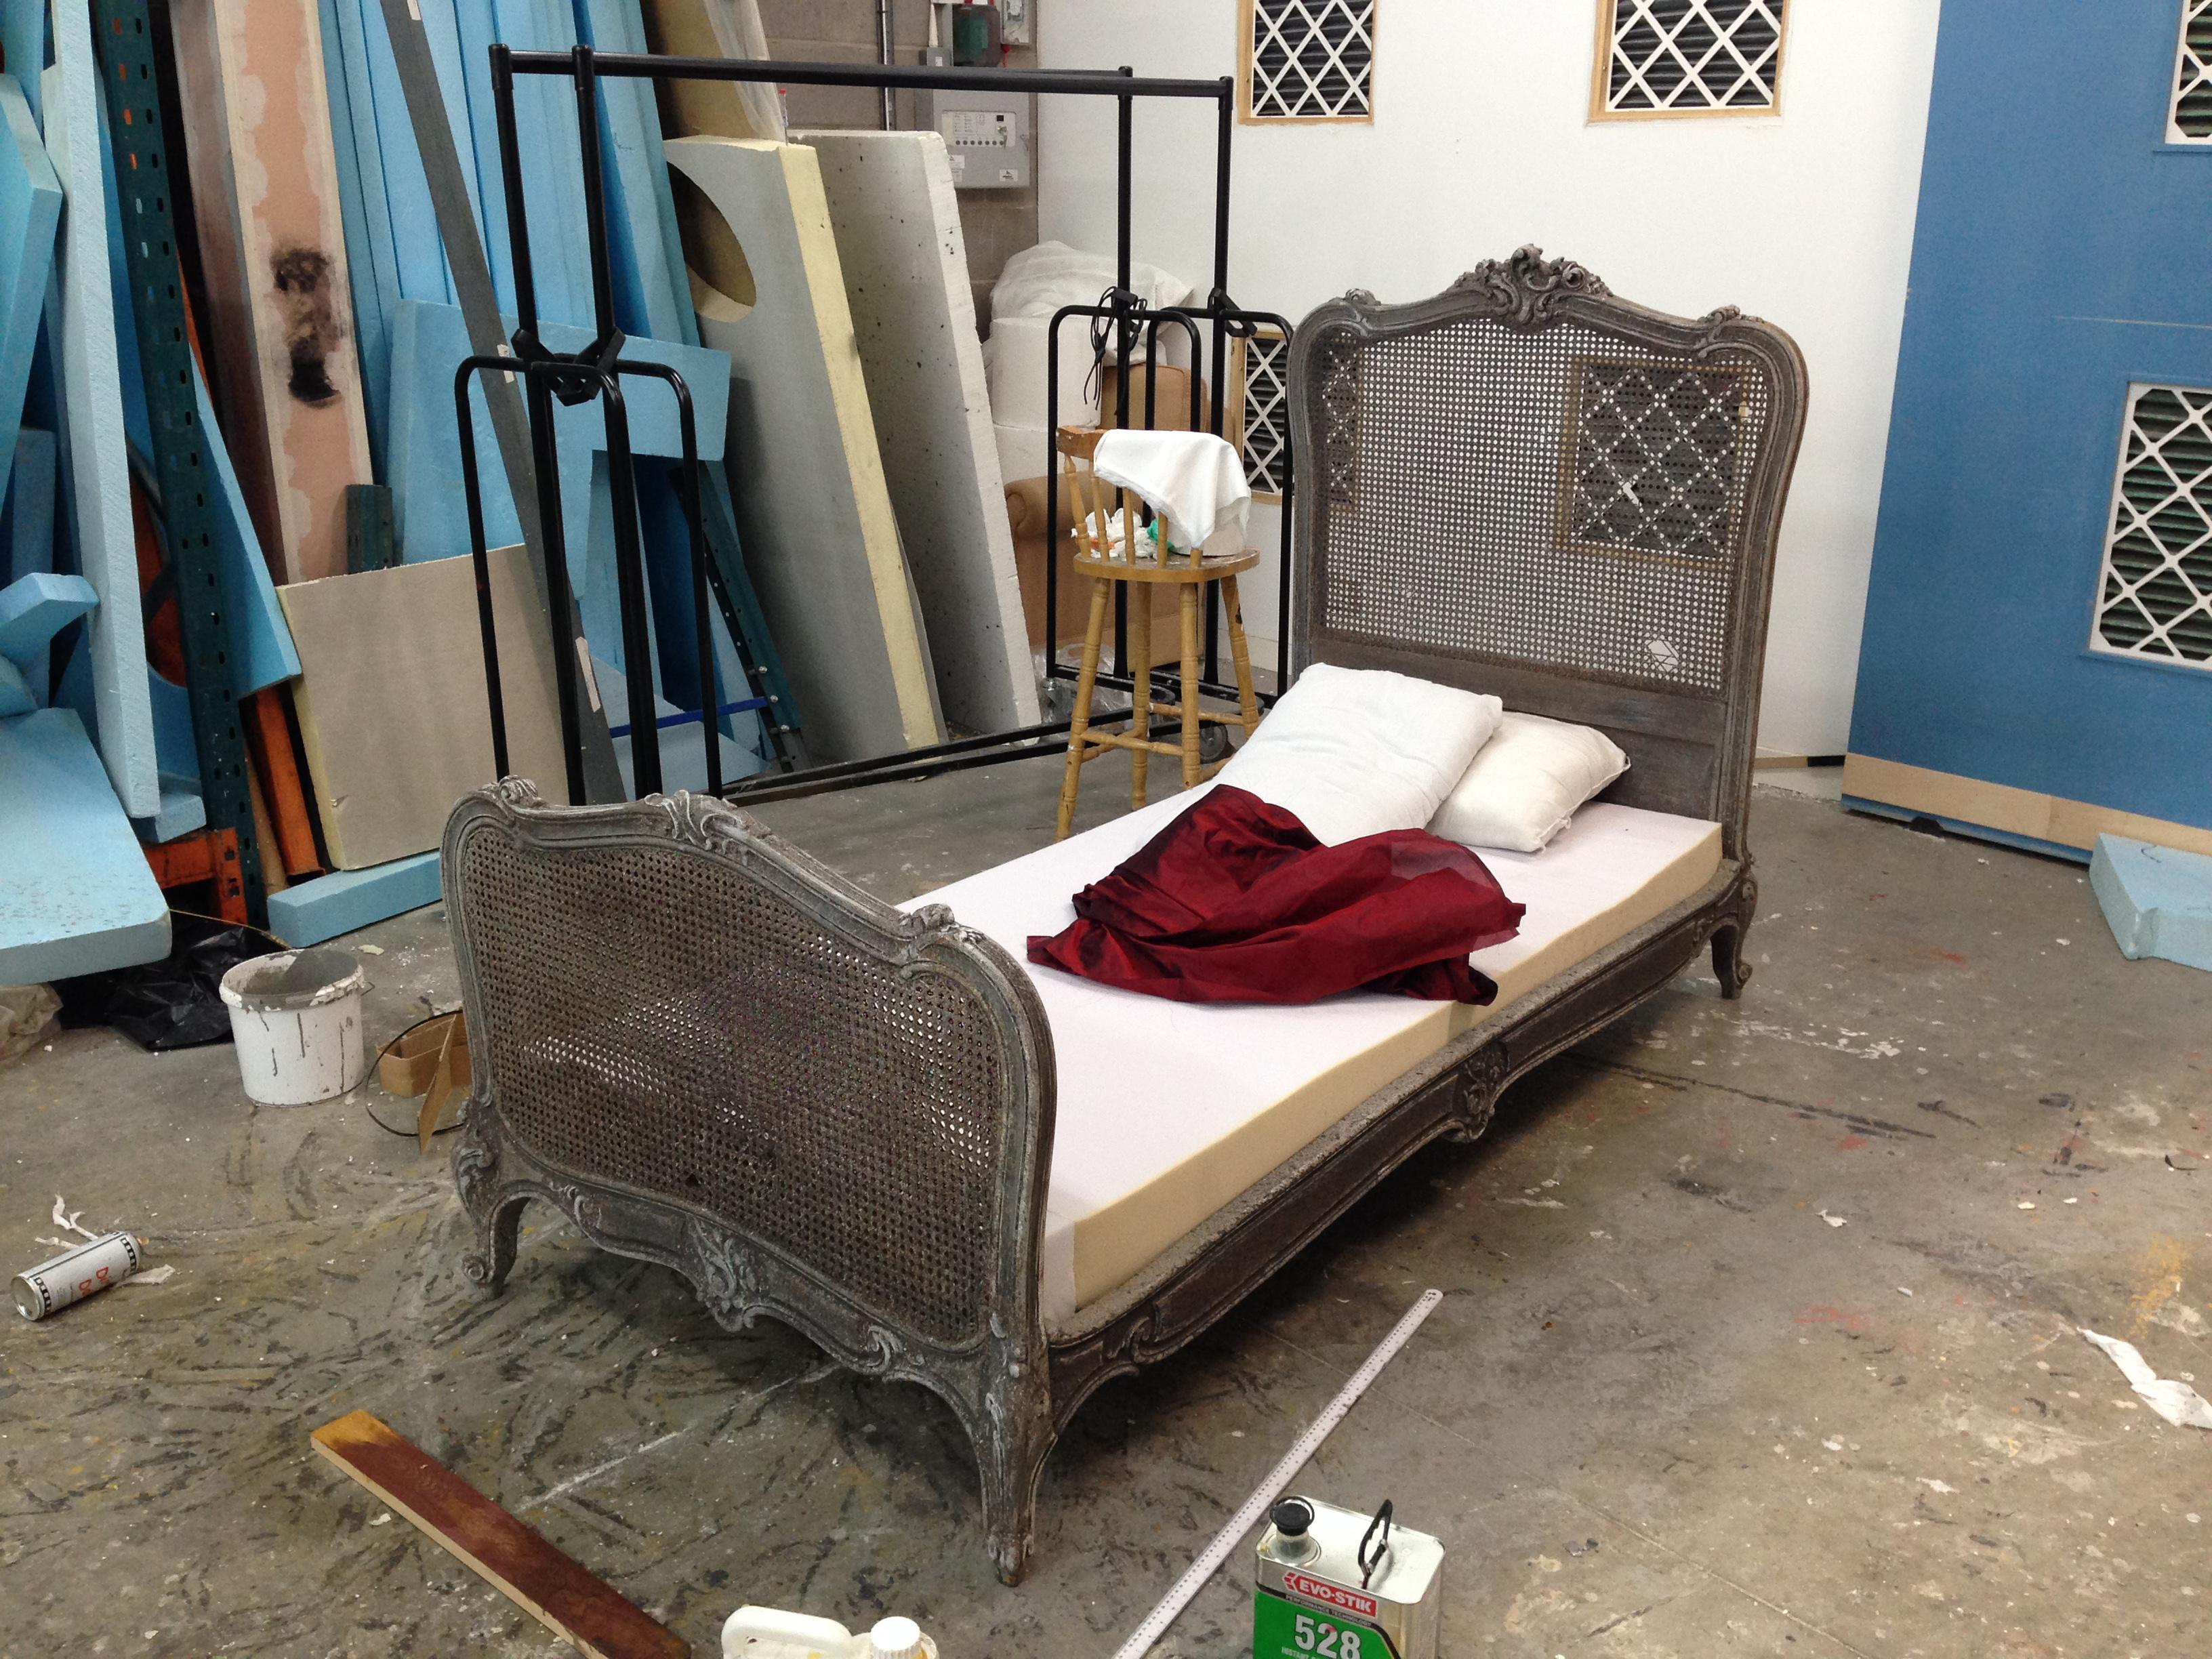 Painted Bedframe